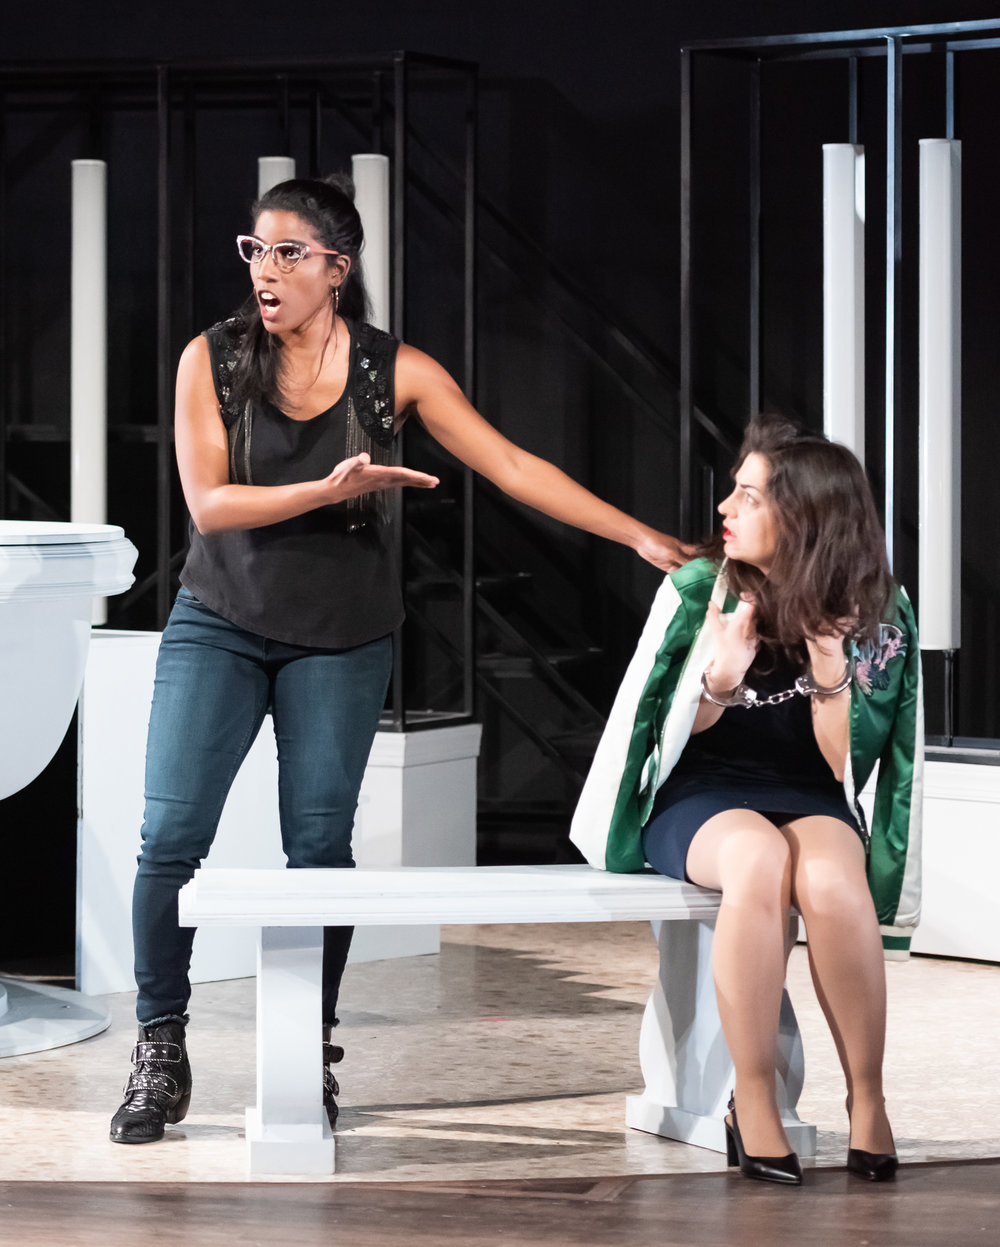 Daniel (Ariana Douglas) comes to Susanna's (Lucia Martín Cardón) defense. Photo by Louis Forget; courtesy of Opera Lafayette.